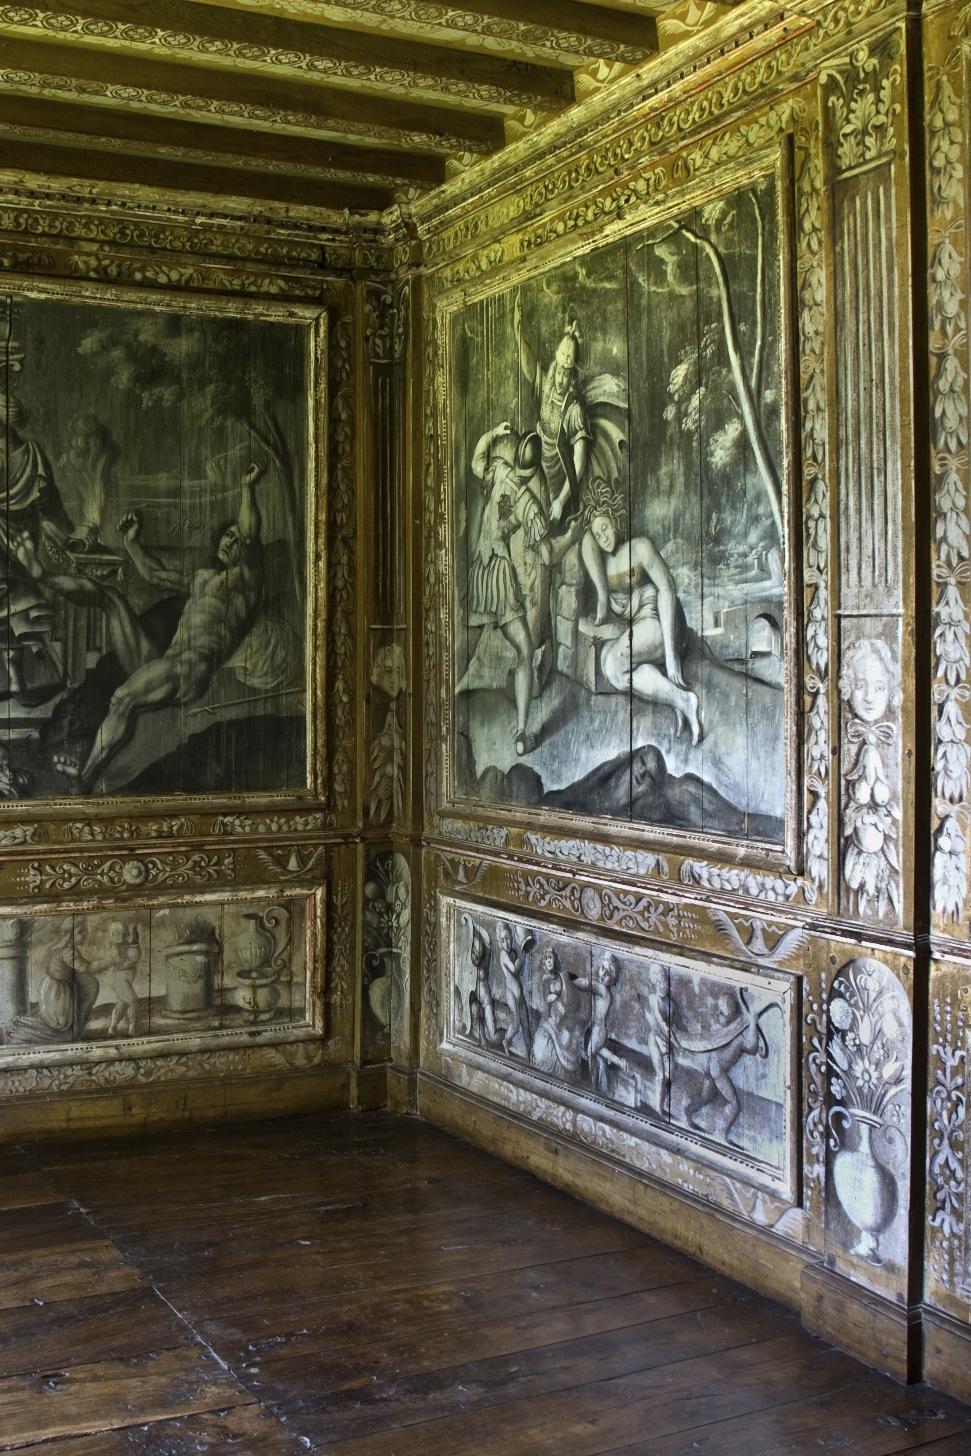 72_24255_9_chateau_puymartin_cabinet_mythologique.jpg